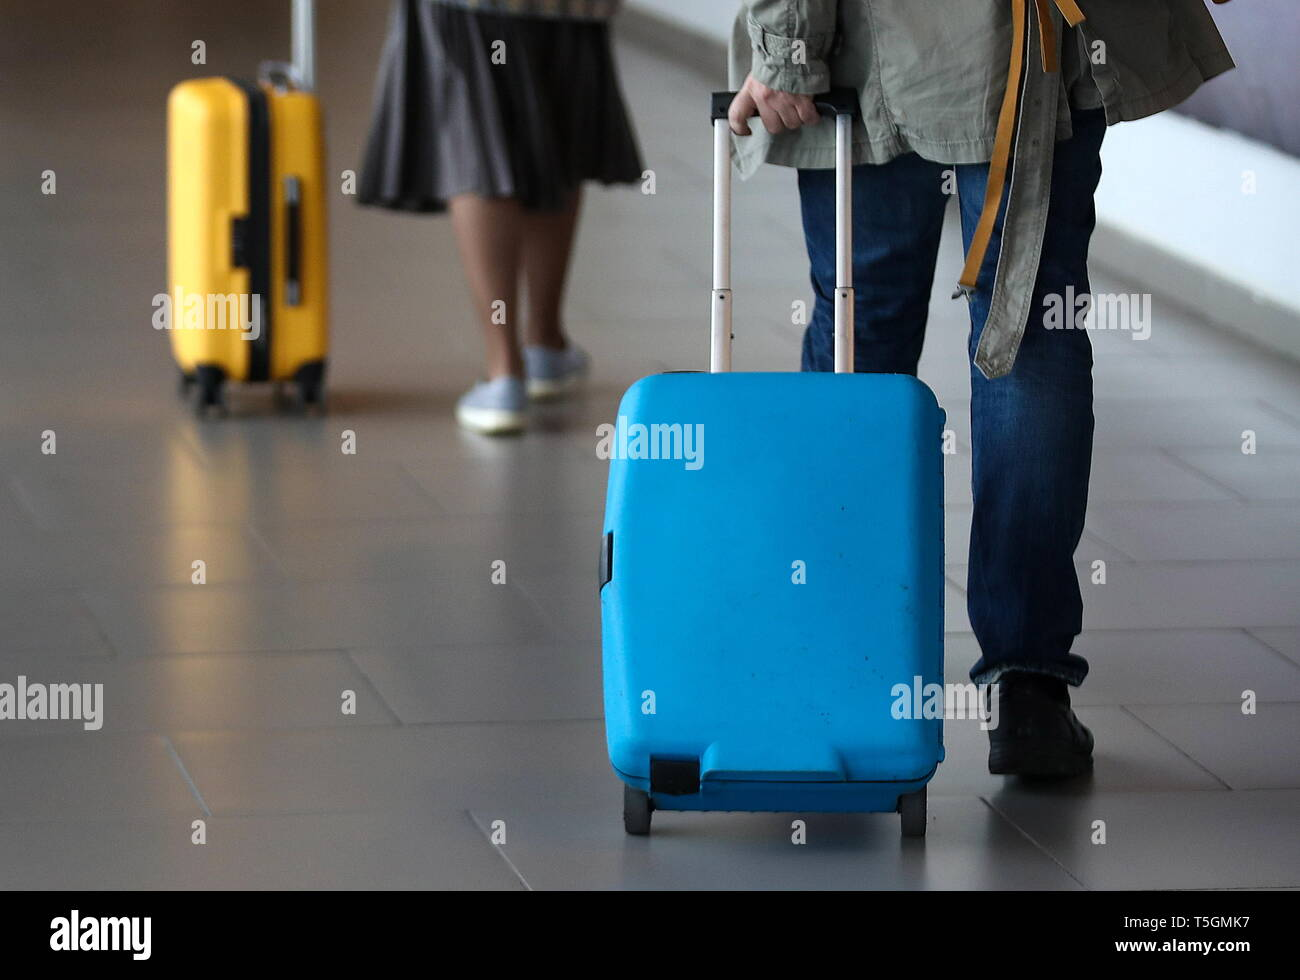 San Pietroburgo, Russia. Xix Apr, 2019. San Pietroburgo, Russia - 19 Aprile 2019: Passeggeri con valigie a Pulkovo Aeroporto Internazionale. Valery Sharifulin/TASS Credito: ITAR-TASS News Agency/Alamy Live News Foto Stock